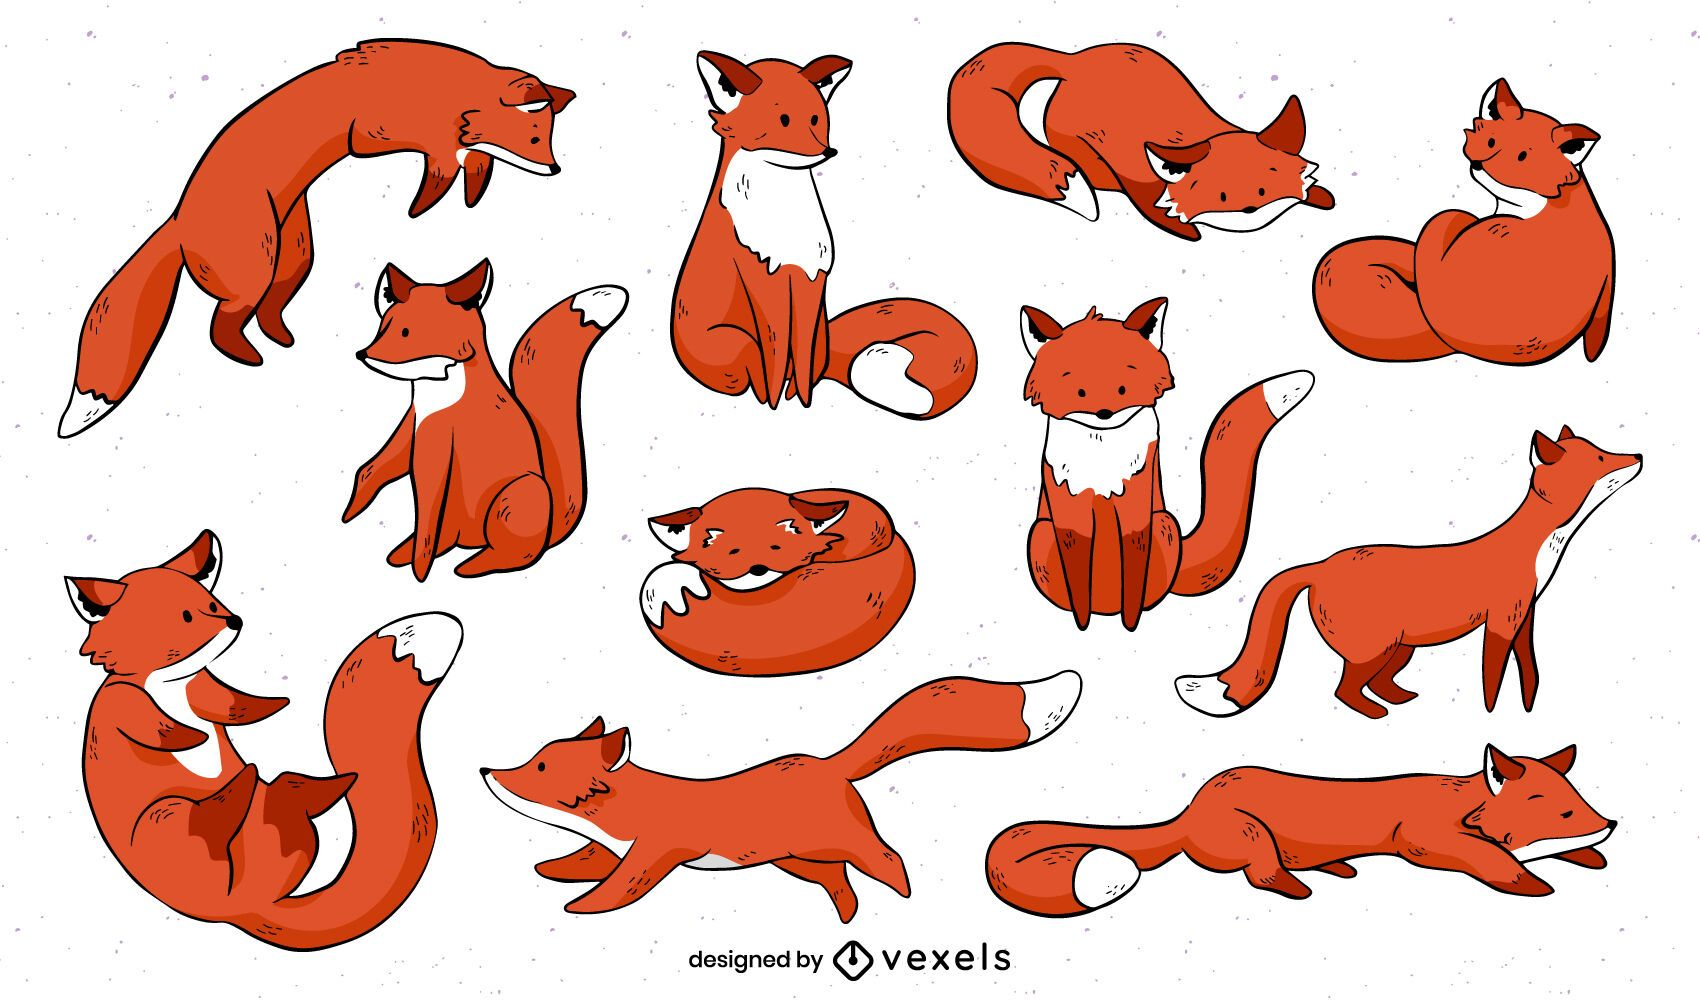 Desenho de cenografia de raposa fofa